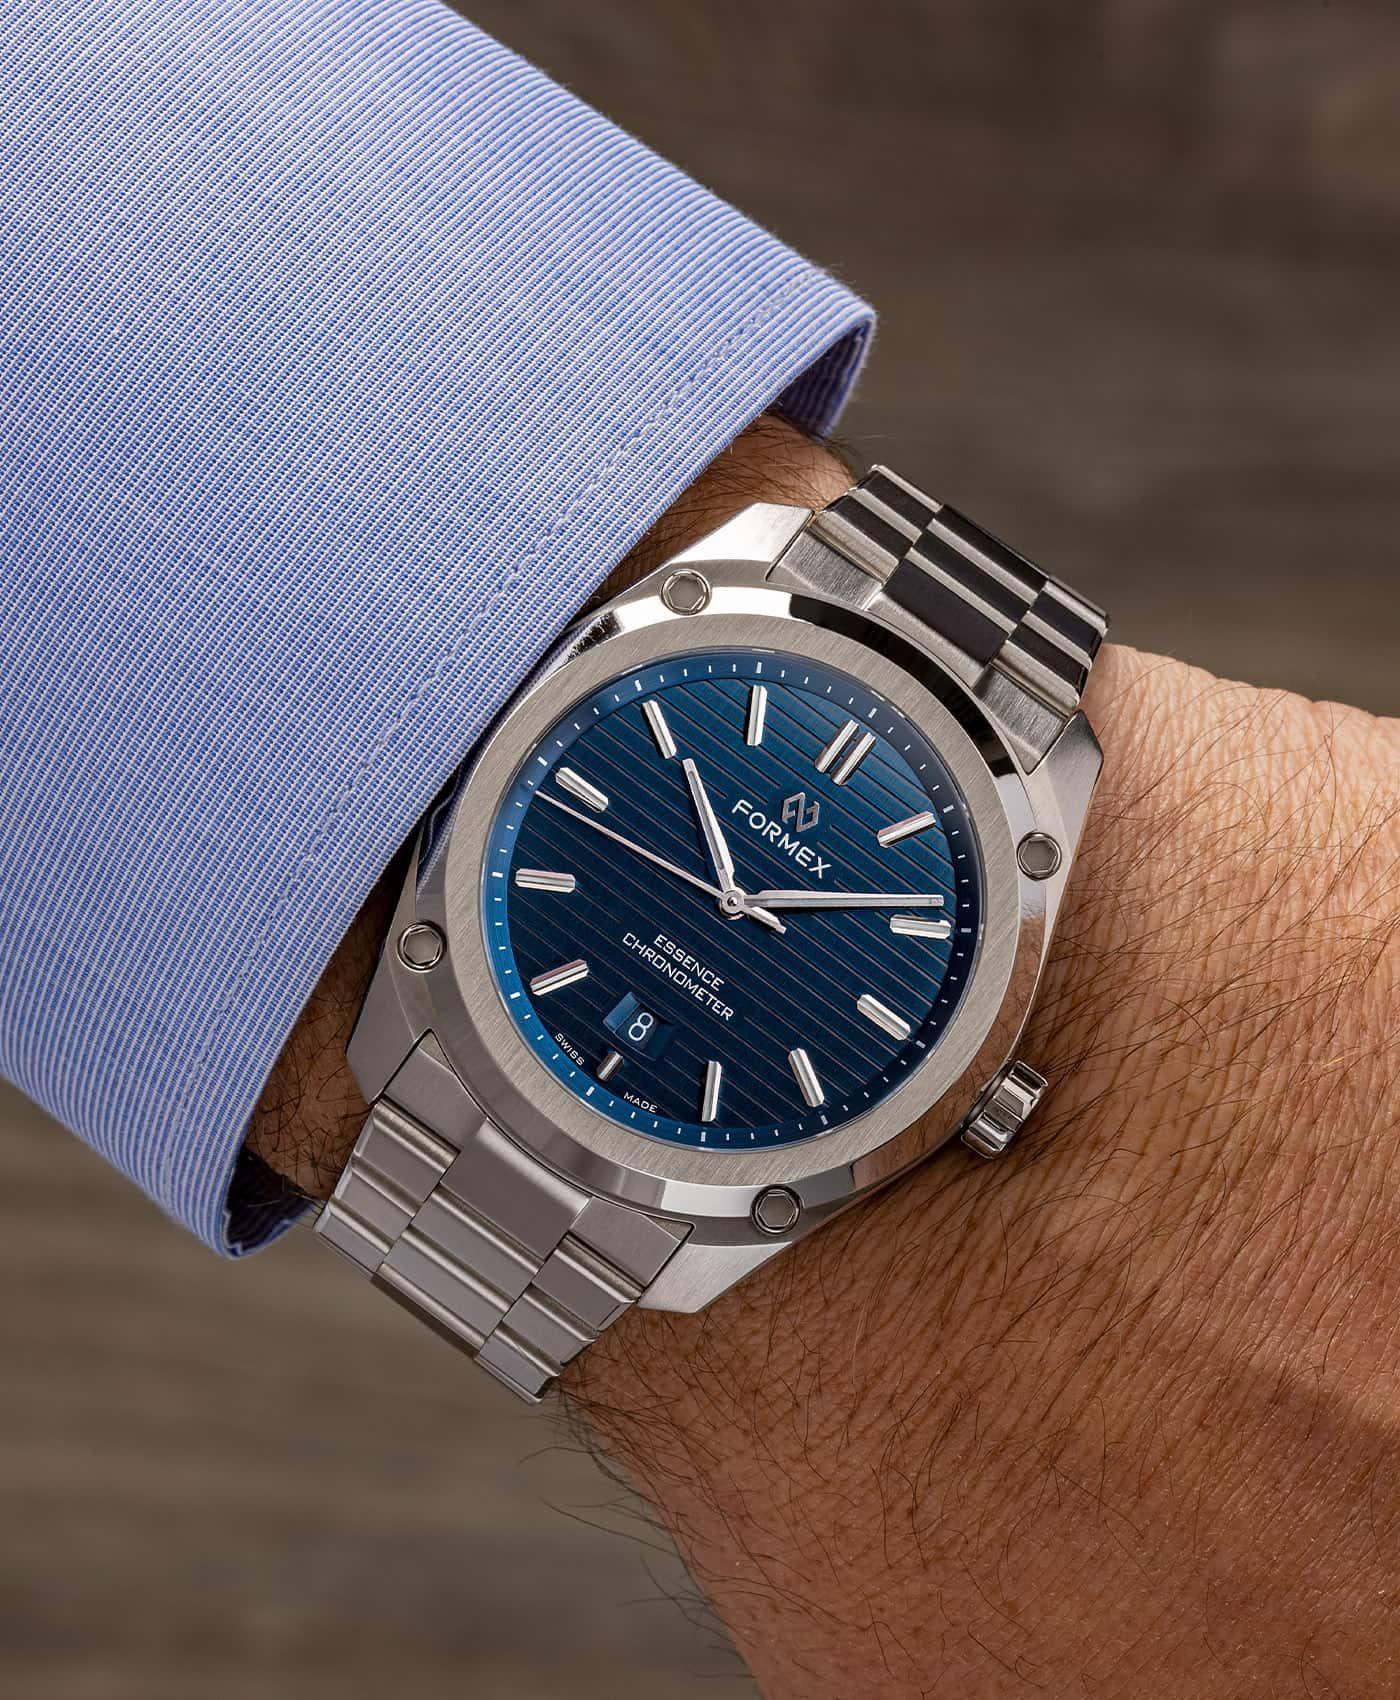 Formex - Essence FortyThree - Automatic Chronometer Blue dial - wrist shot